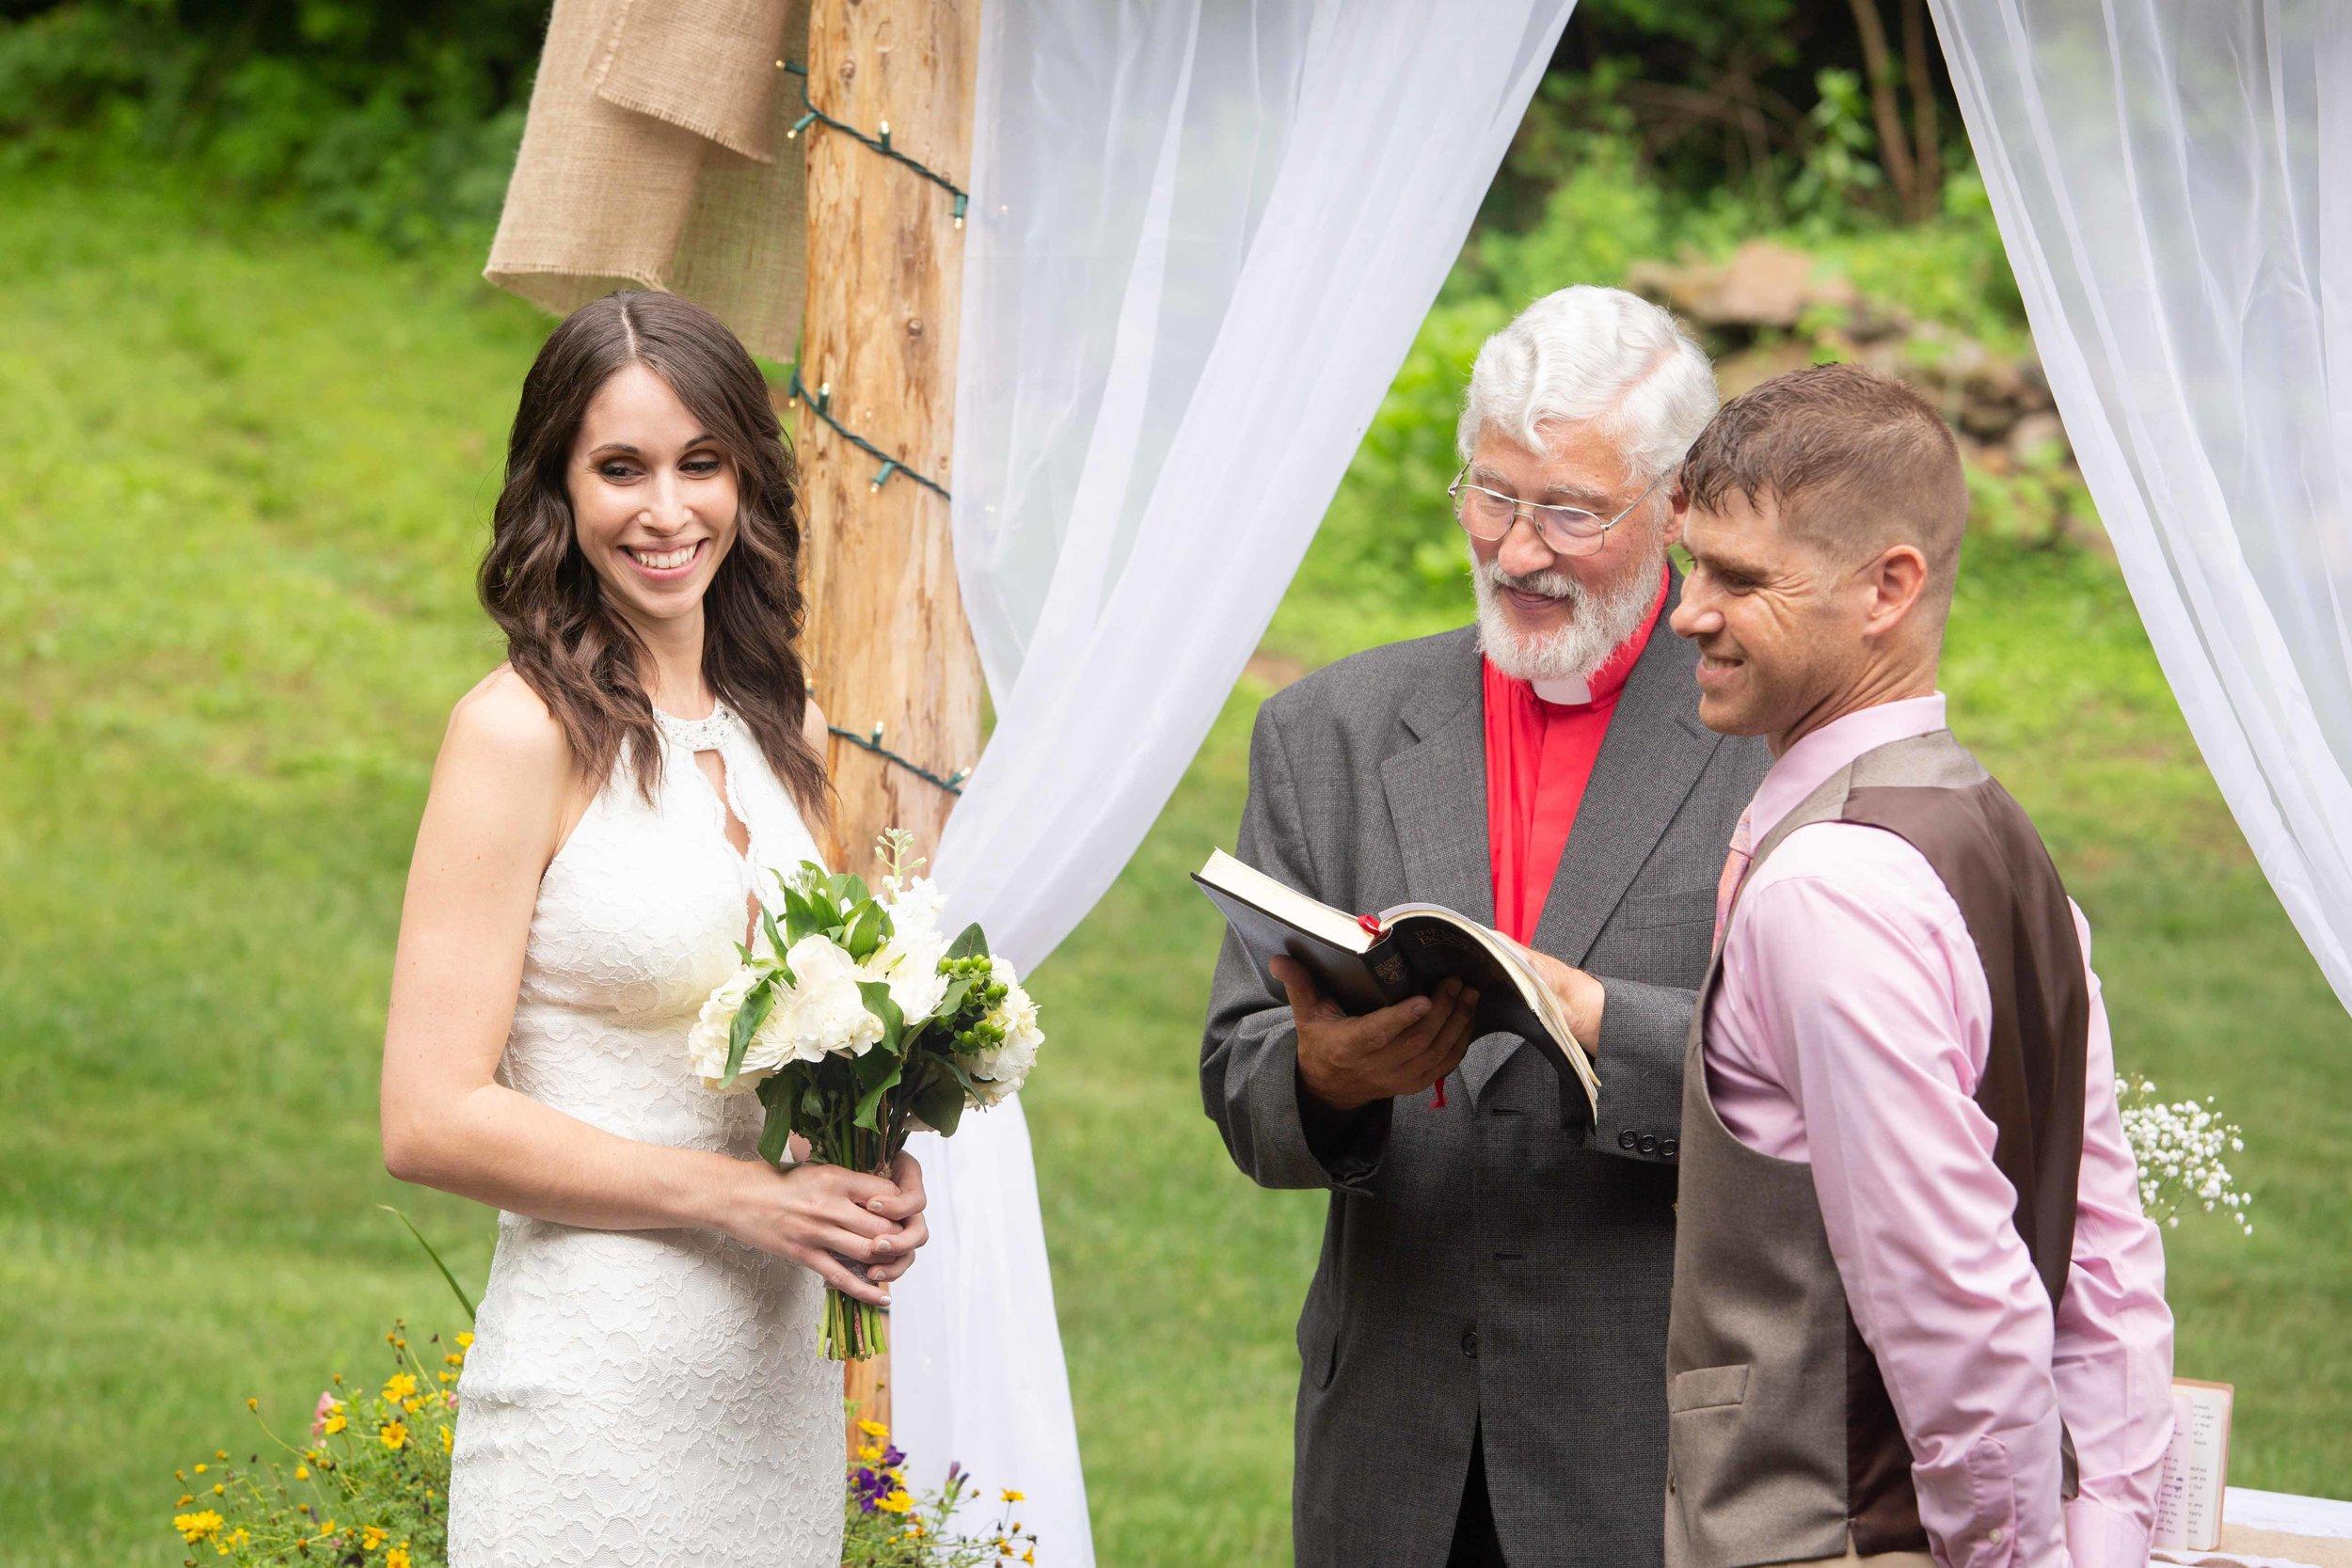 Vow Renewal, Wedding Photography-10.jpg